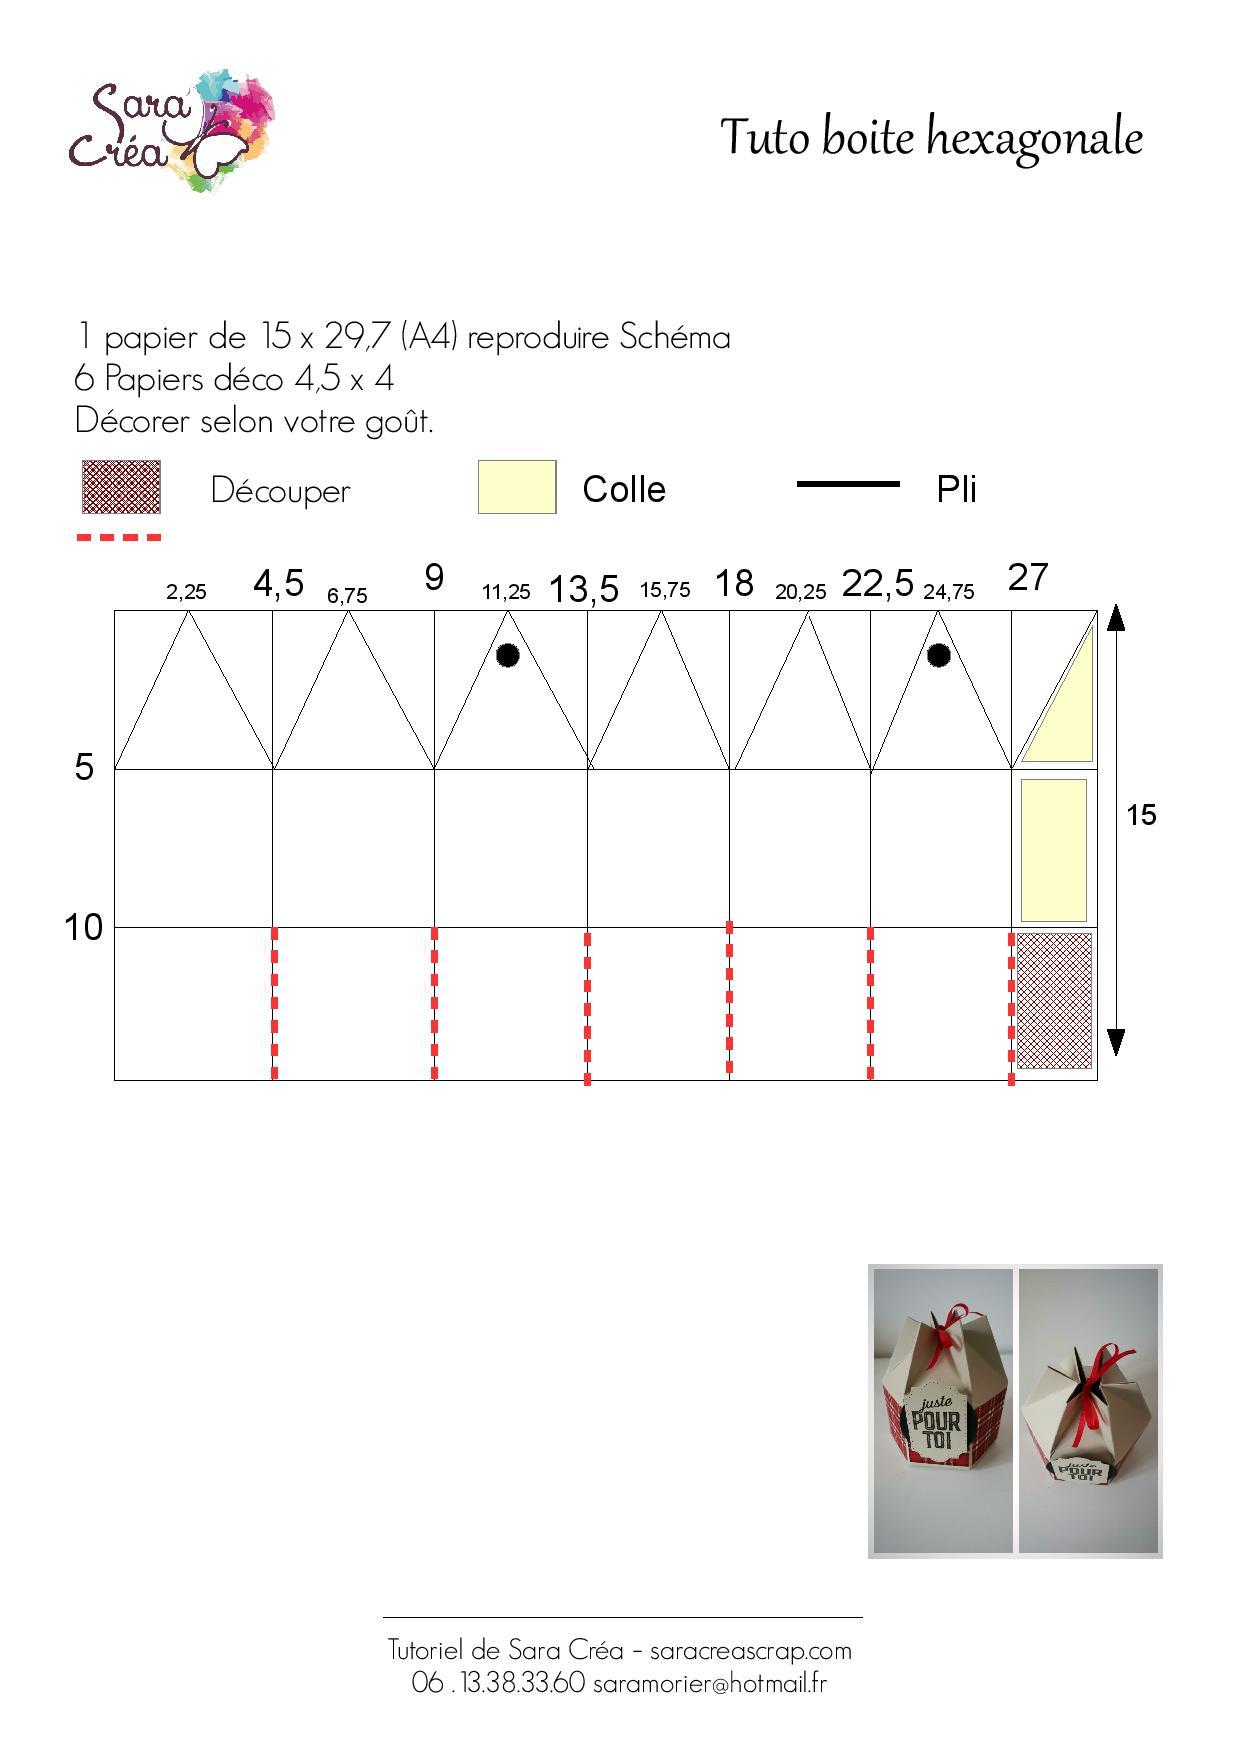 boite hexagonale-page-001.jpg